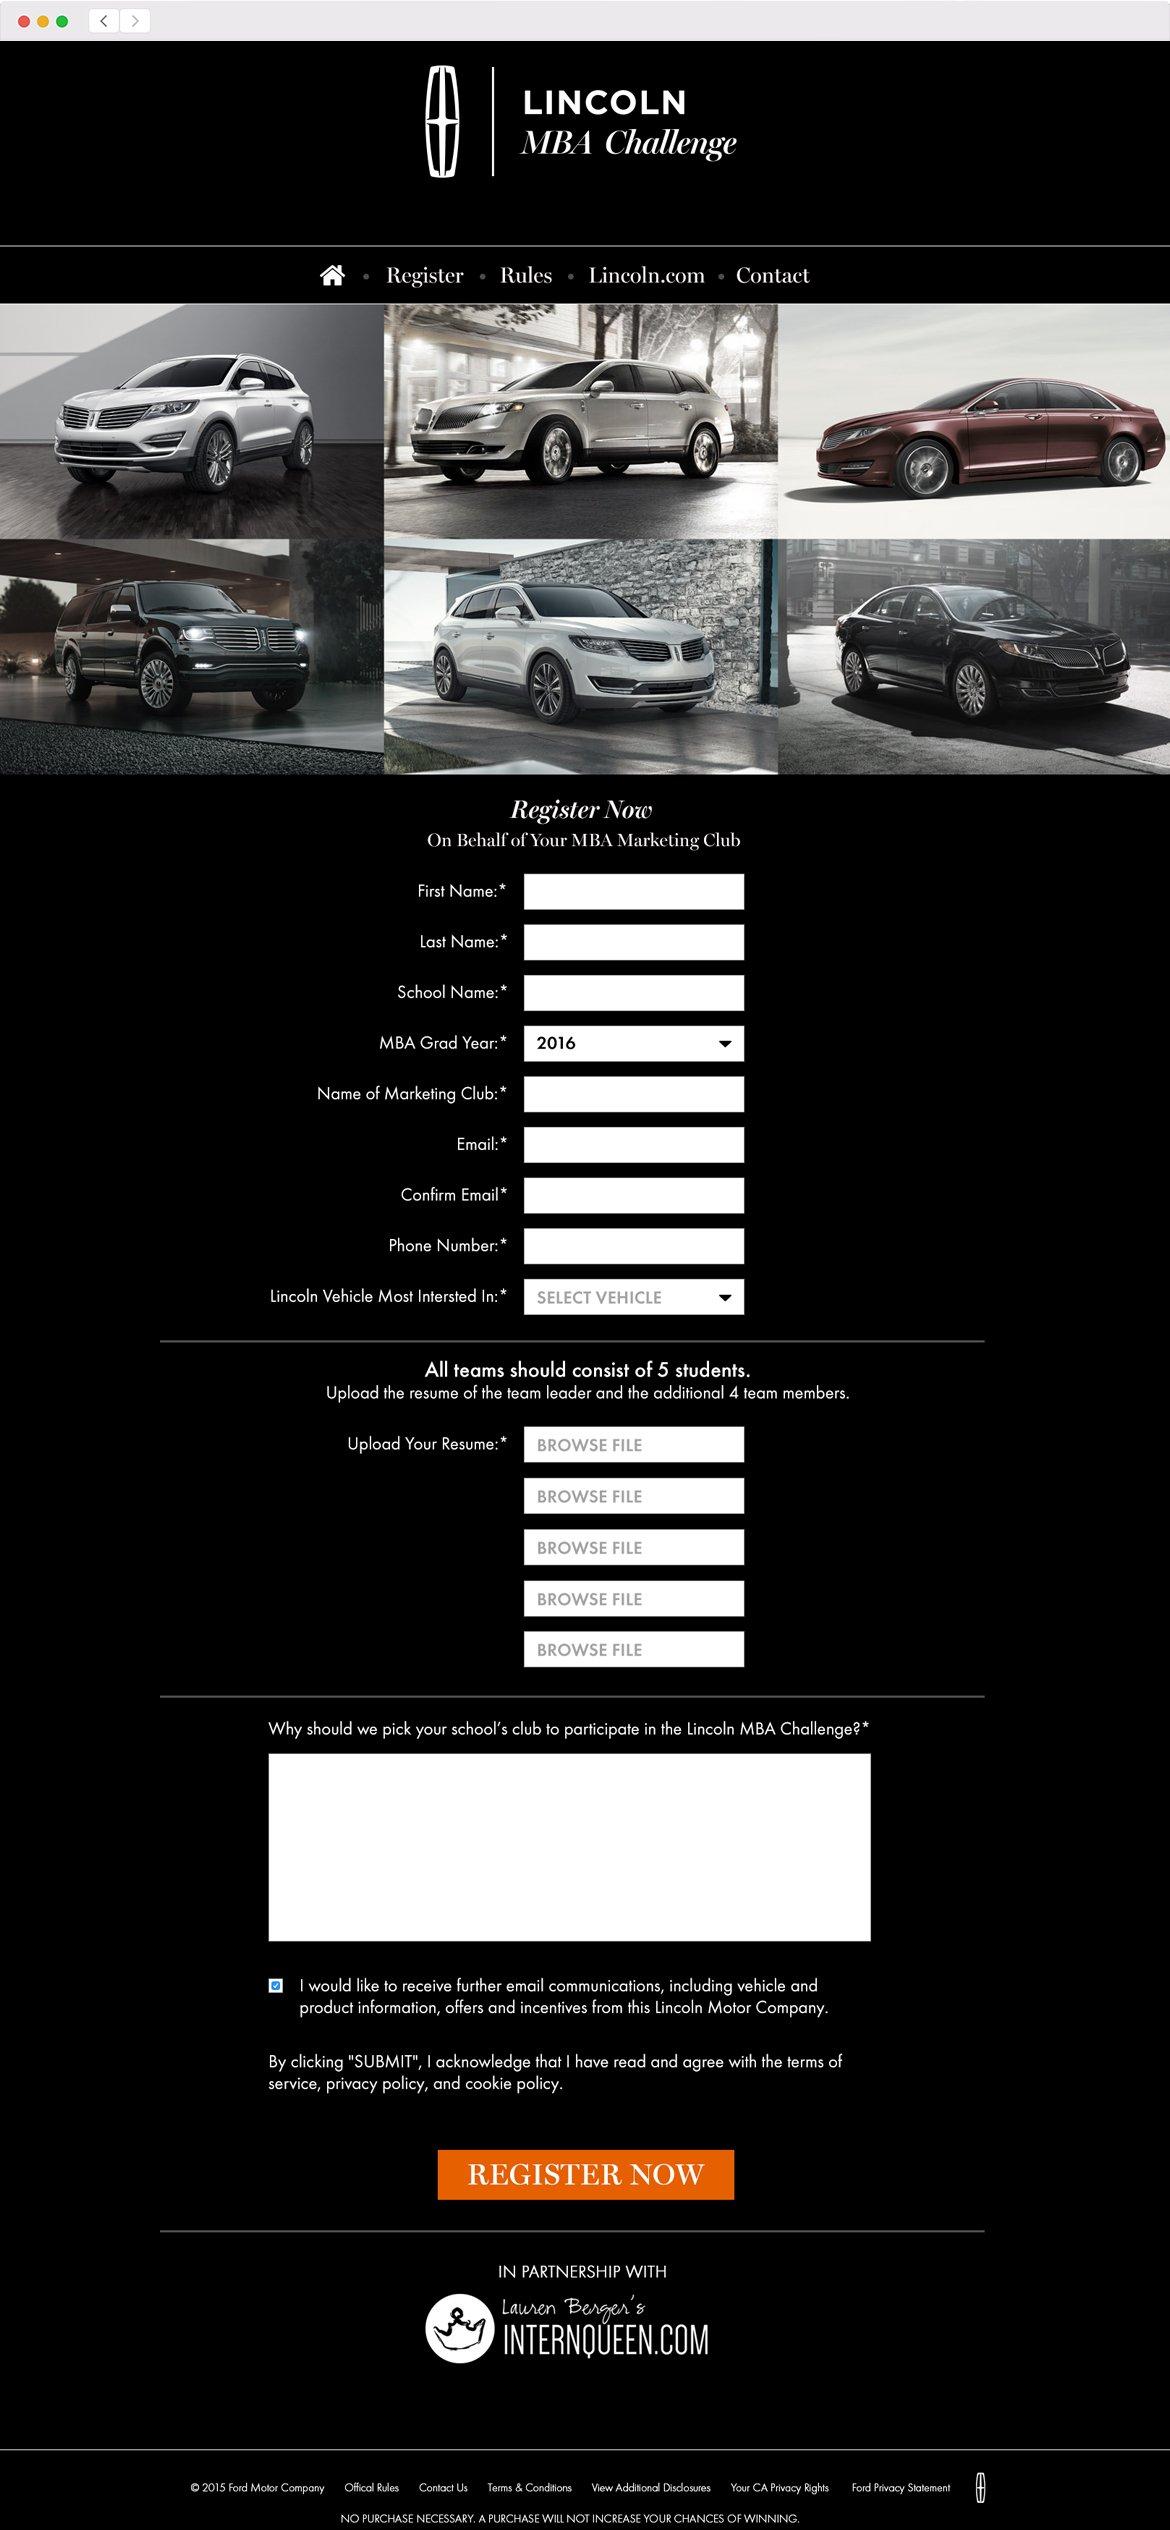 Lincoln MBA Challenge Web